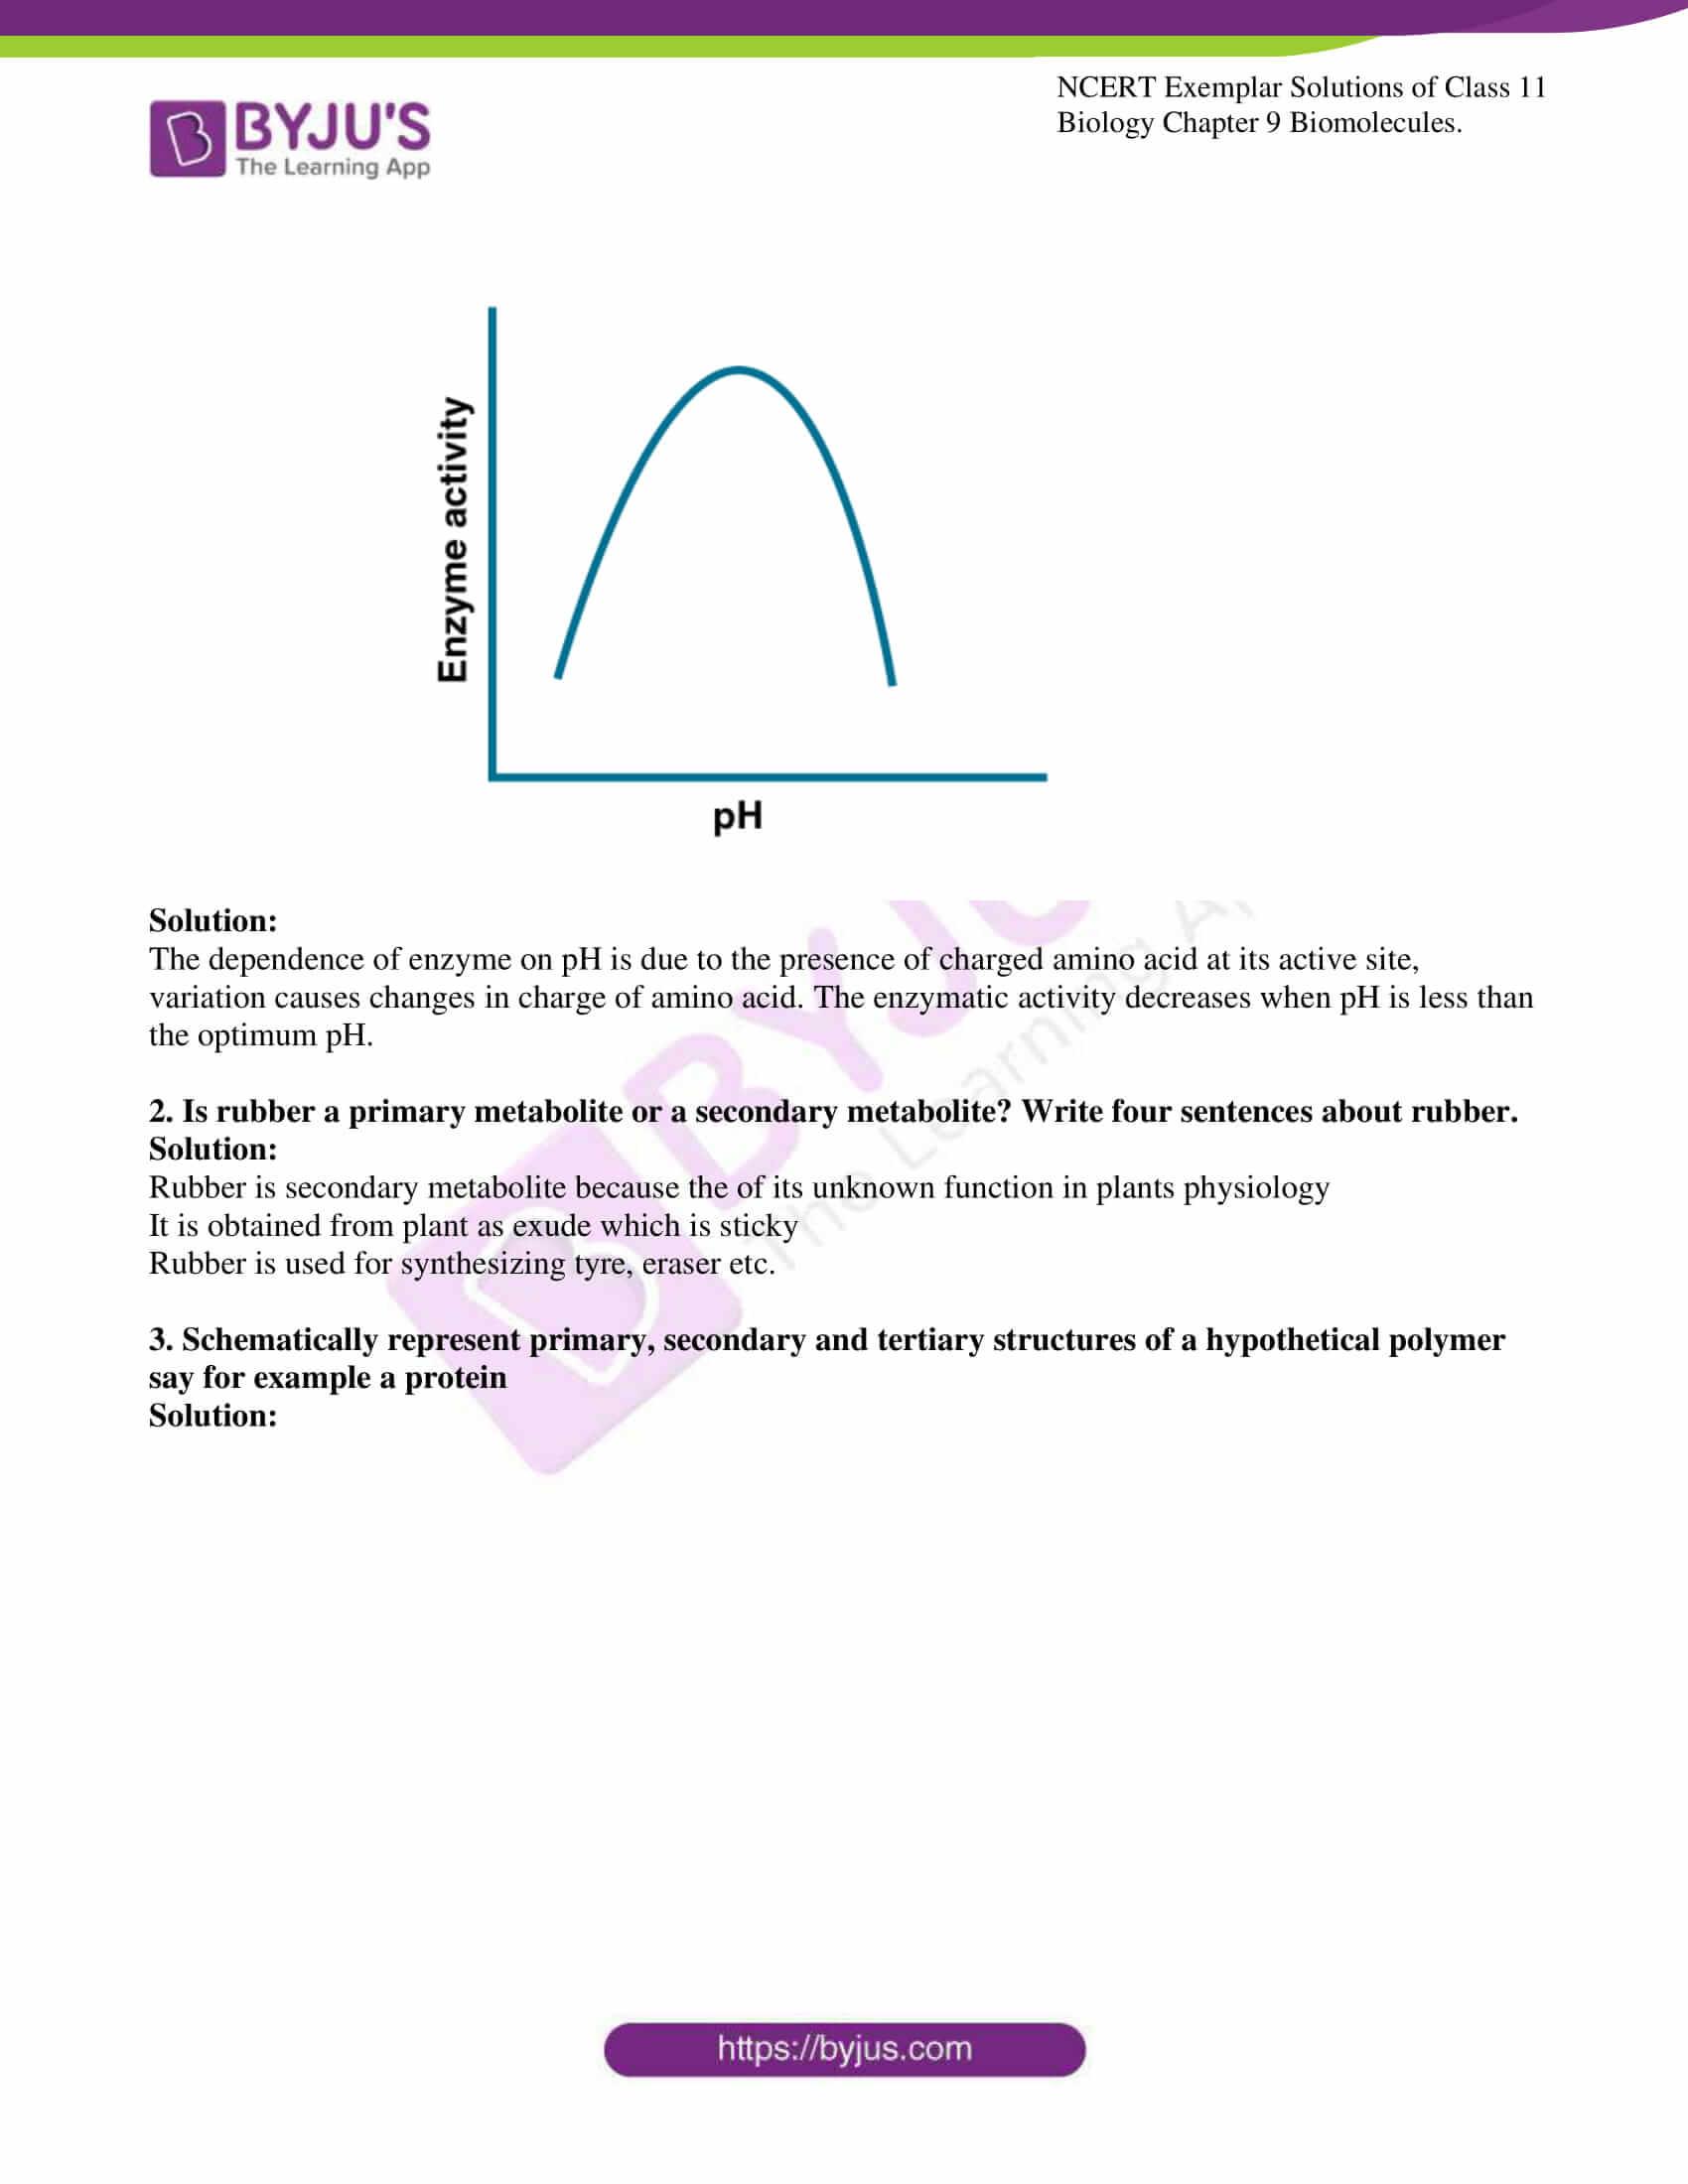 ncert exemplar solutions for class 11 bio chapter 9 6